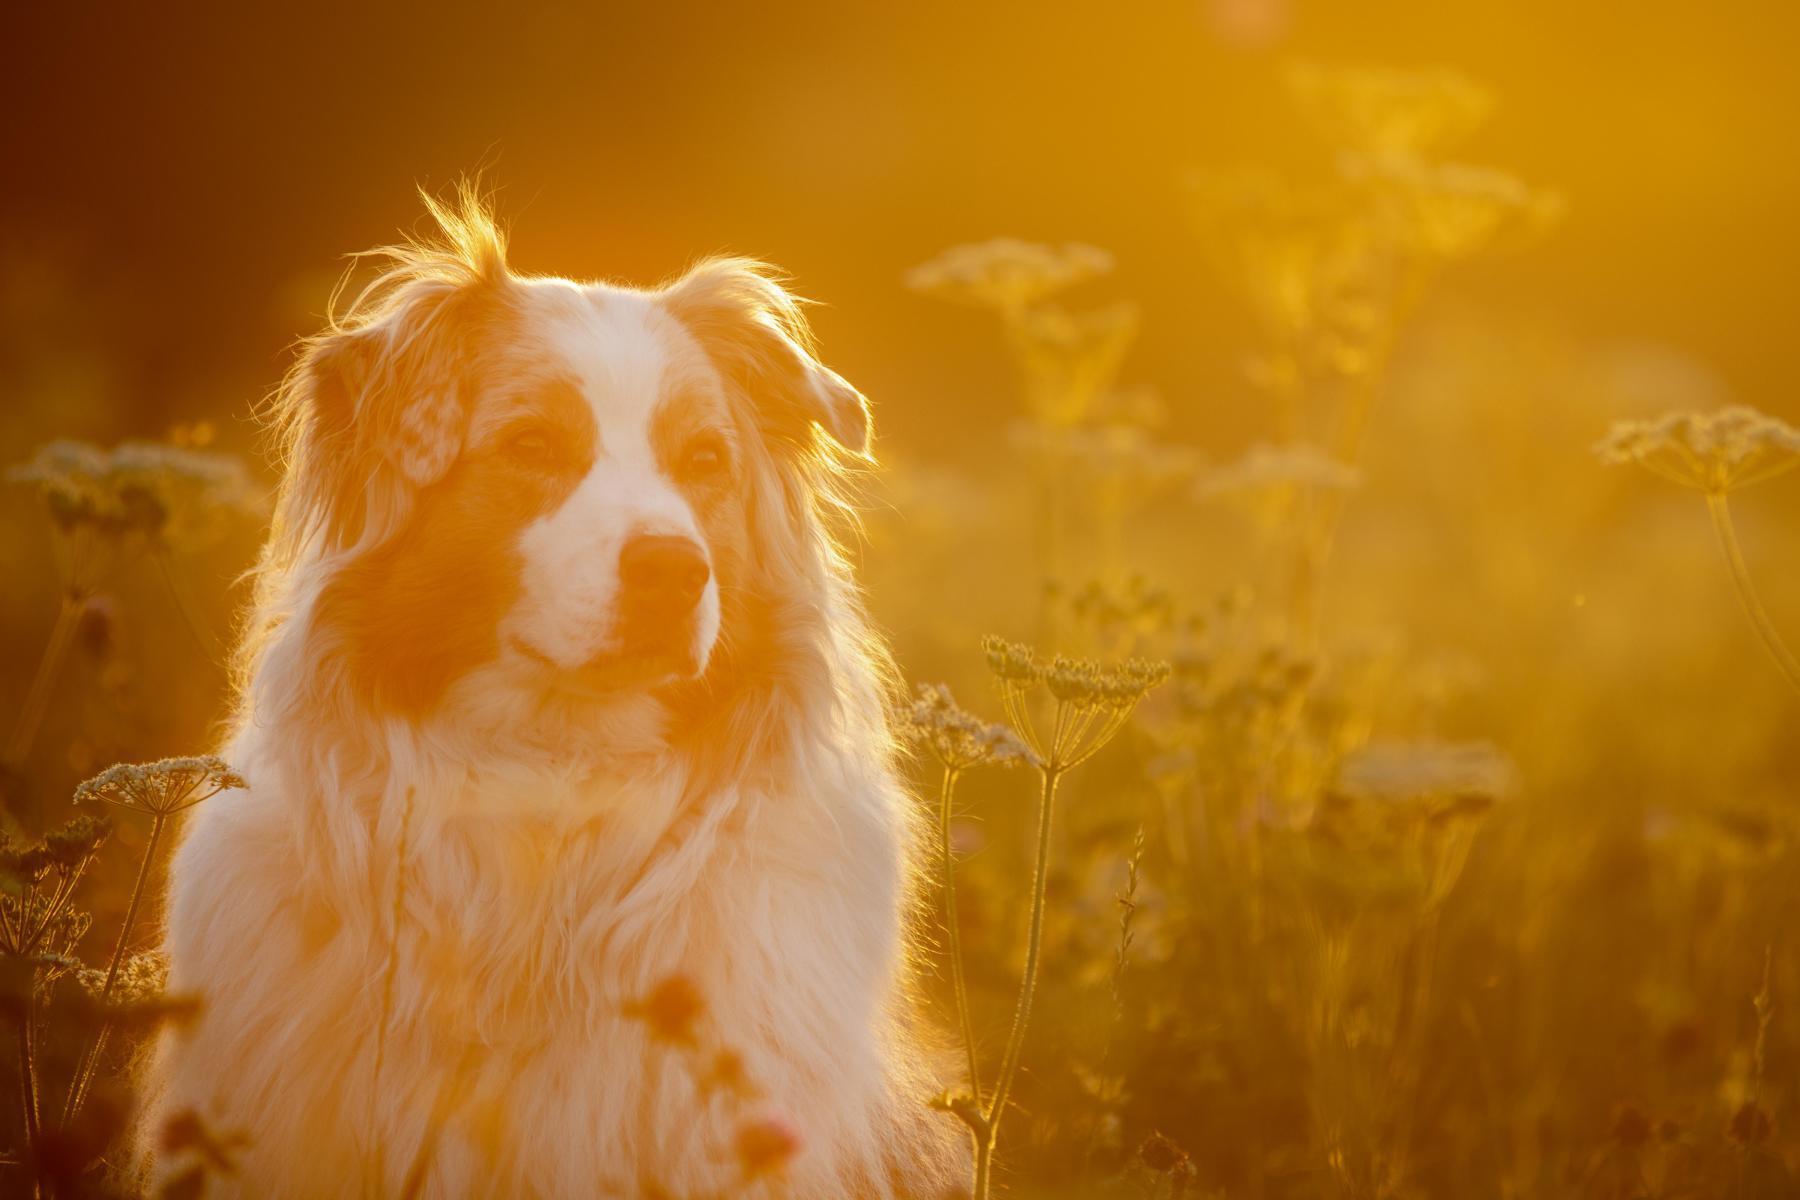 Aussie, Australien Shepherd, Hundebild, Hundeshooting, Sonnenuntergang, Sonnenuntergangsshooting, Abendshooting, Shooting am Abend, Dog, Dogpicture, Spießhof, Herdwangen - Schönach, Schönach, Herdwangen, Überlingen, Sipplingen